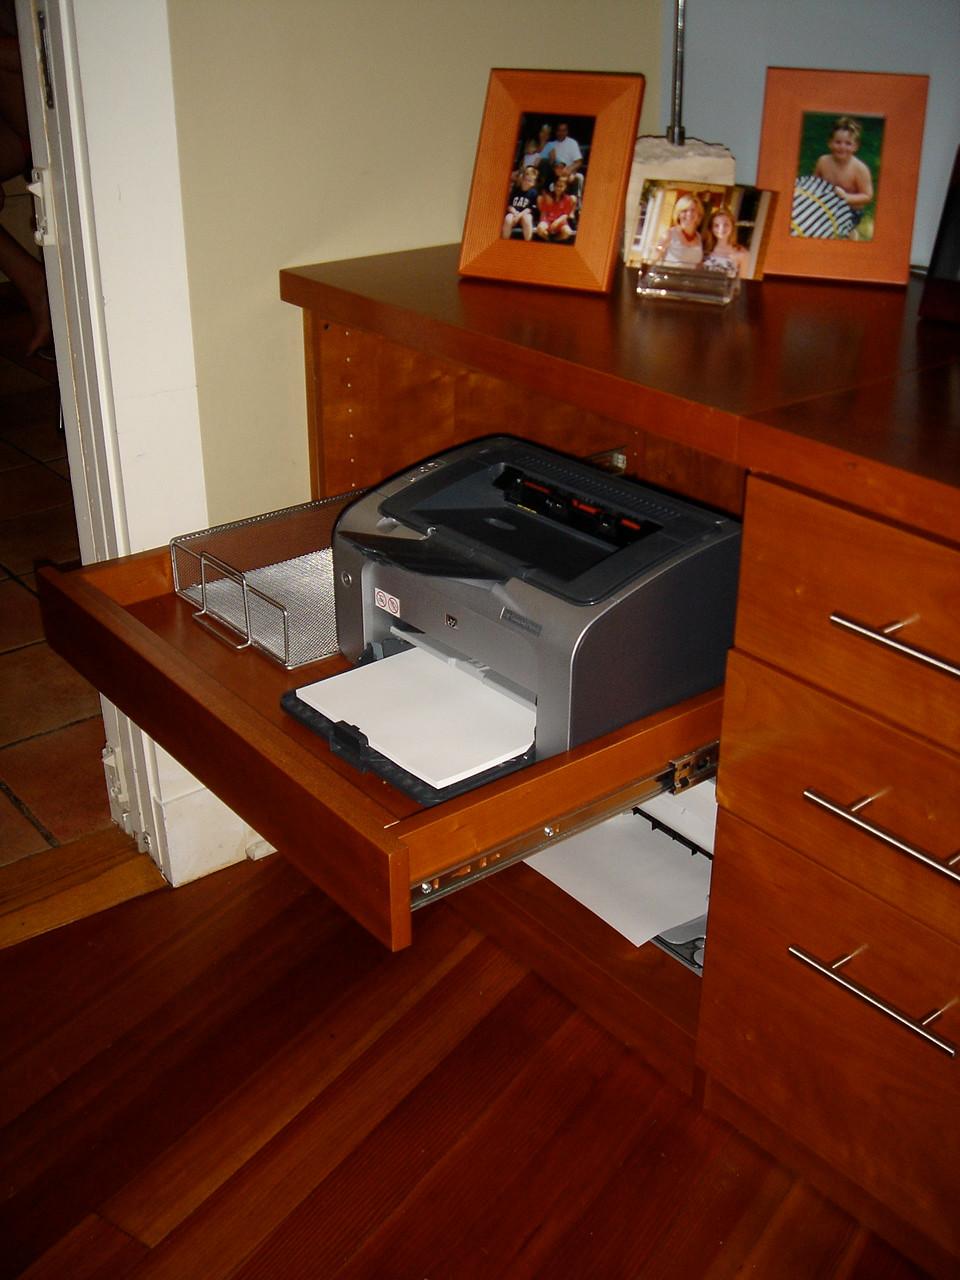 Printer Slideout tray